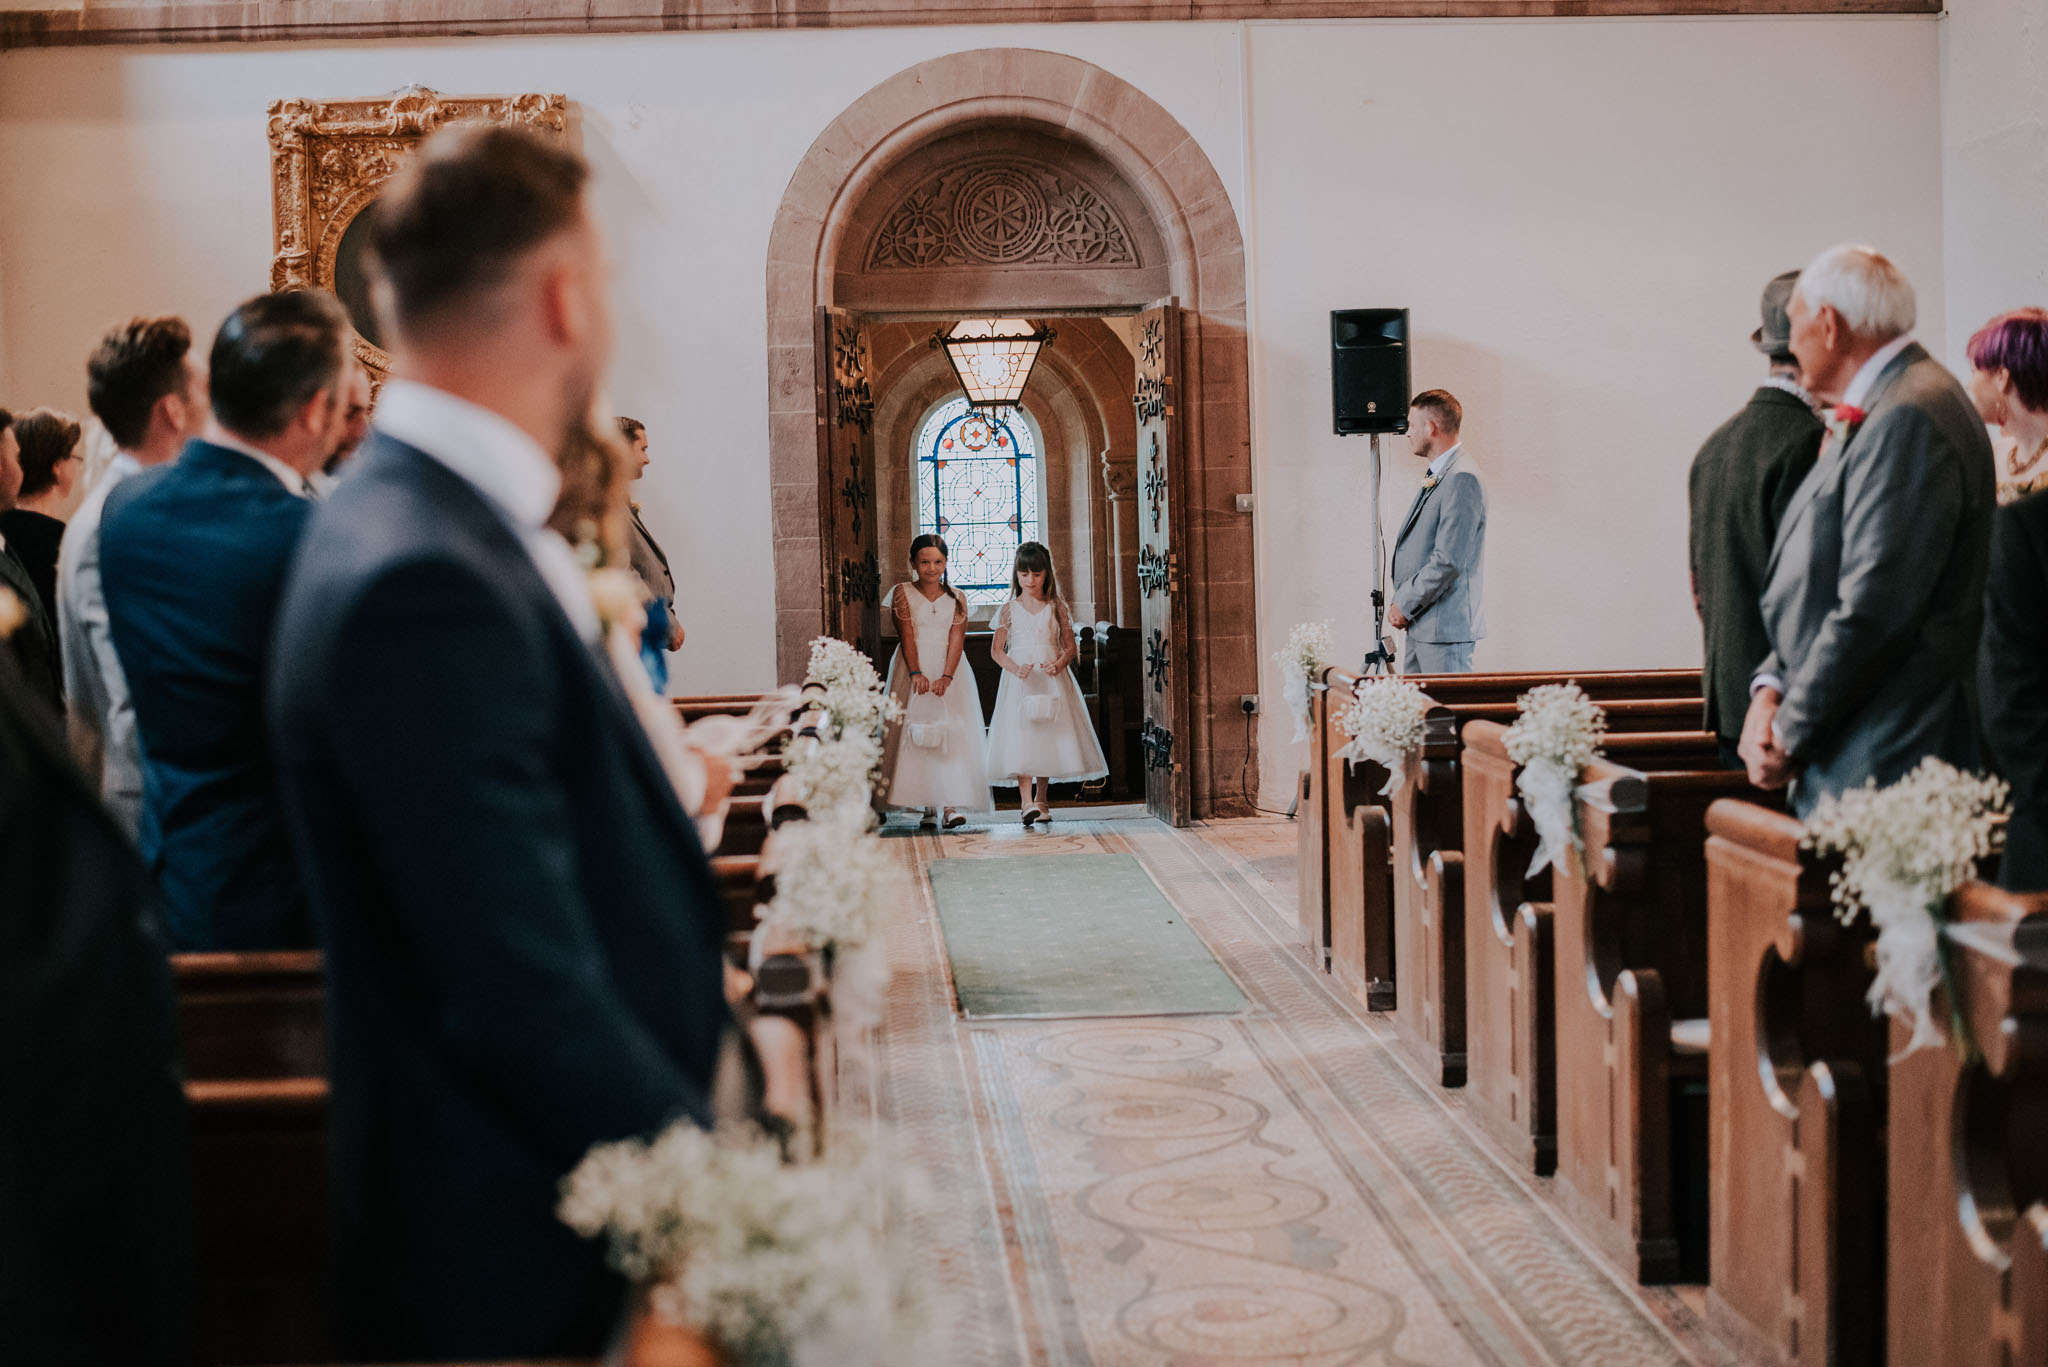 wedding-photographer-glewstone-court-hereford-scott-stockwell-photography156.jpg